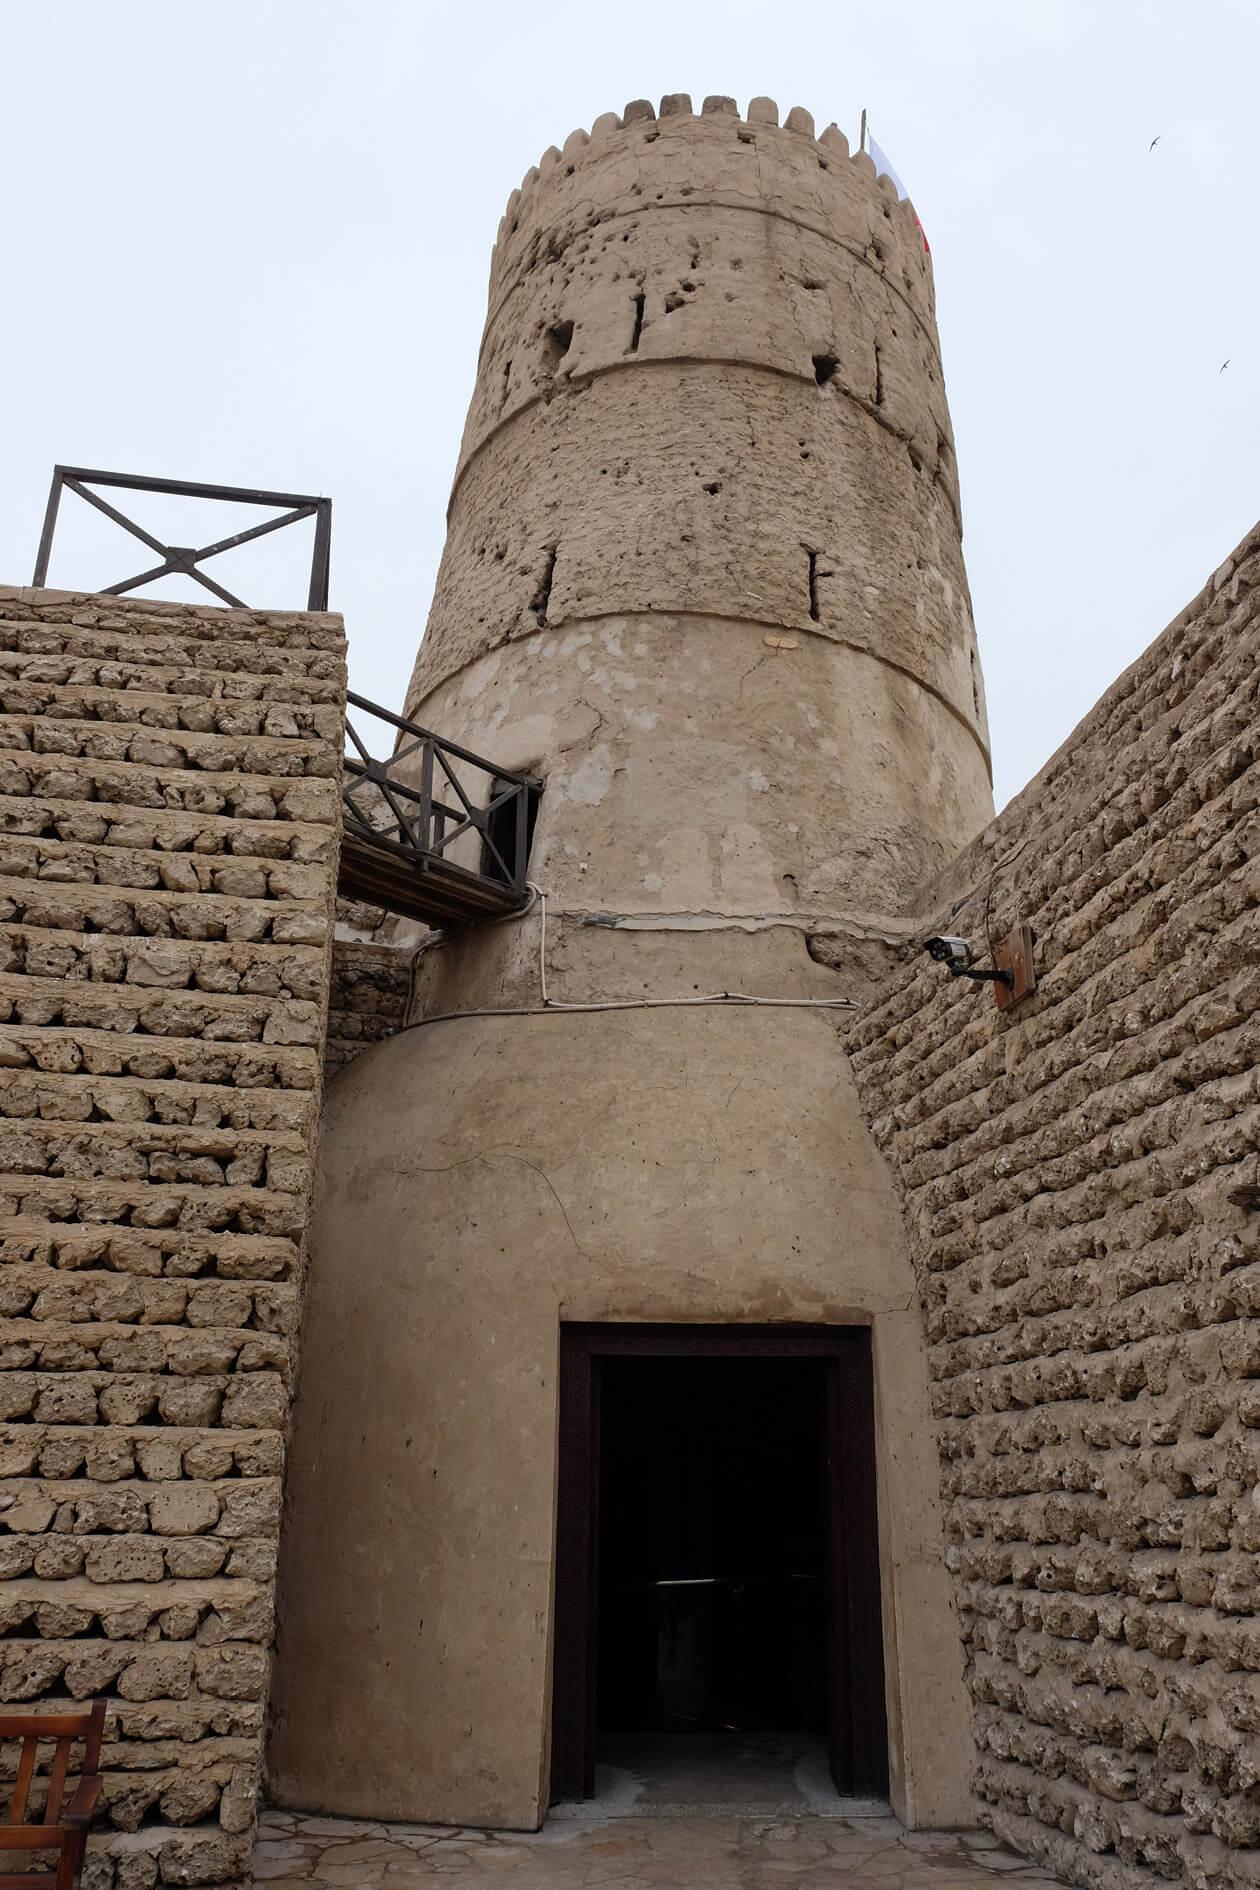 The Dubai Museum is housed in the Al Fahidi Fort - Dubai's oldest building